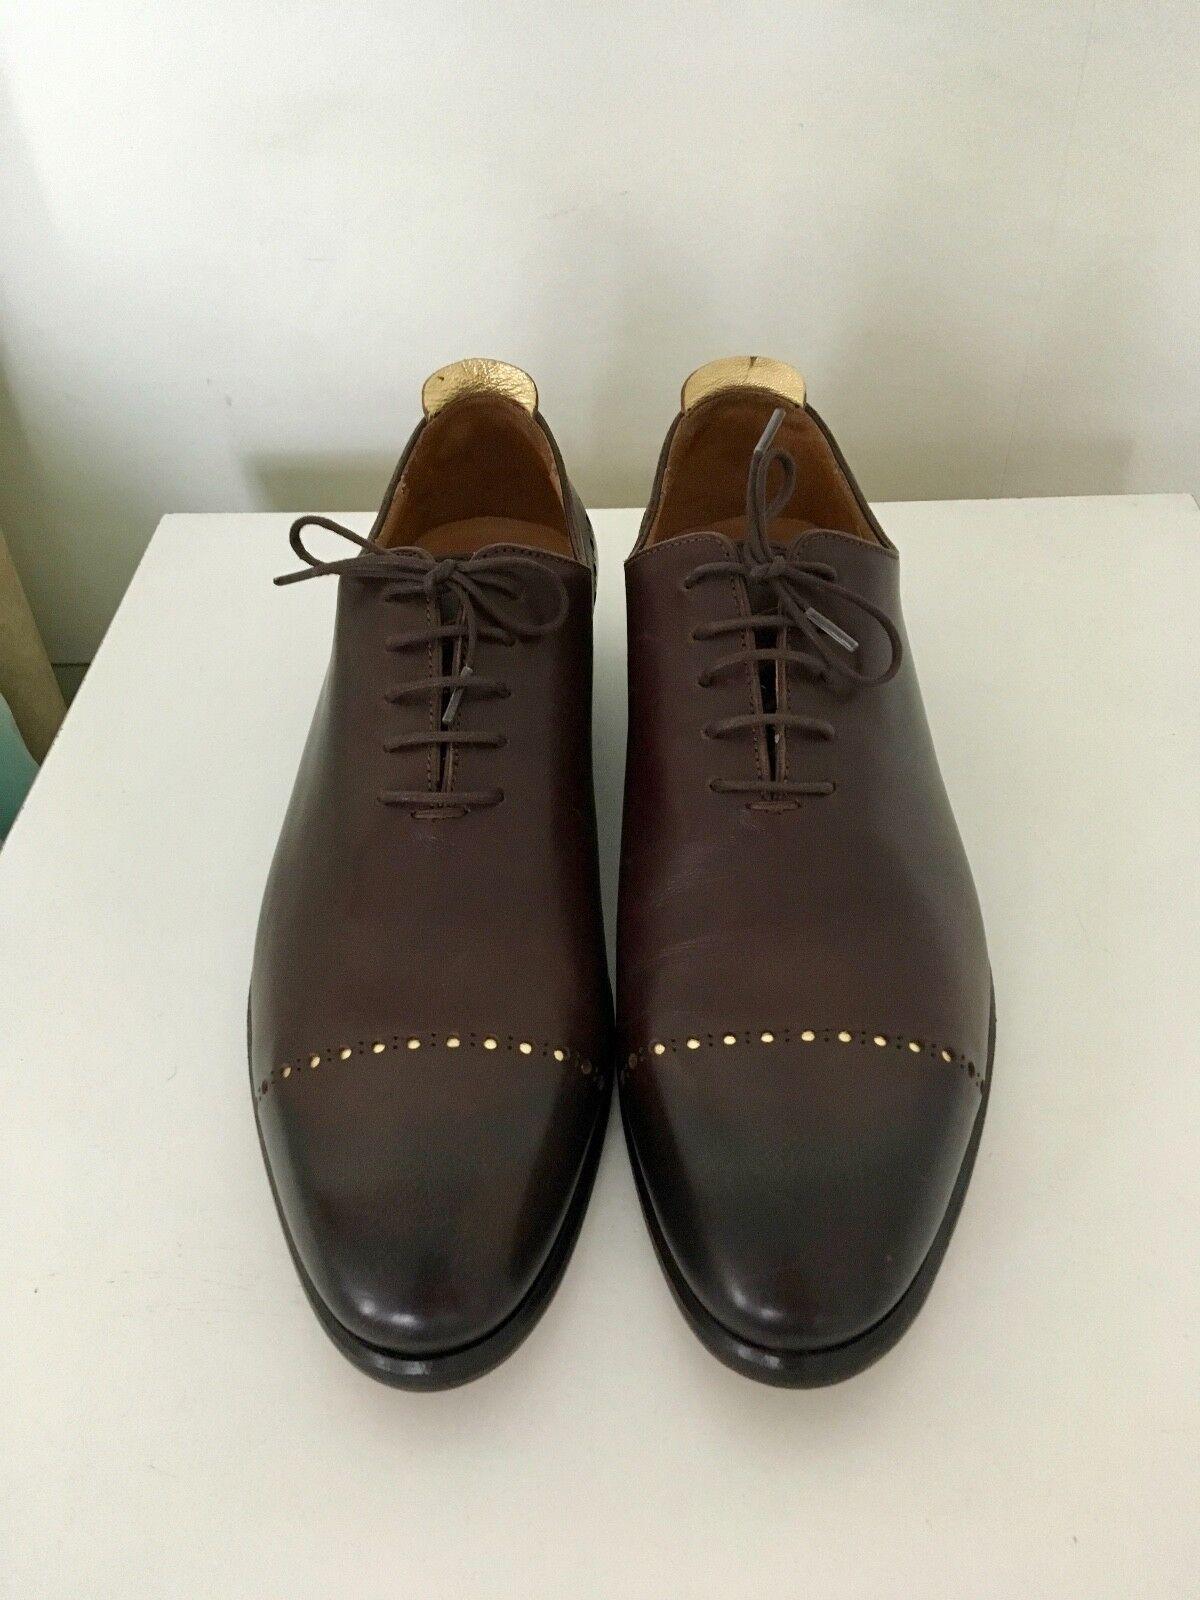 JUSTIN Deakin HAND MADE Scarpe da uomo in pelle UK9 Scarpe classiche da uomo